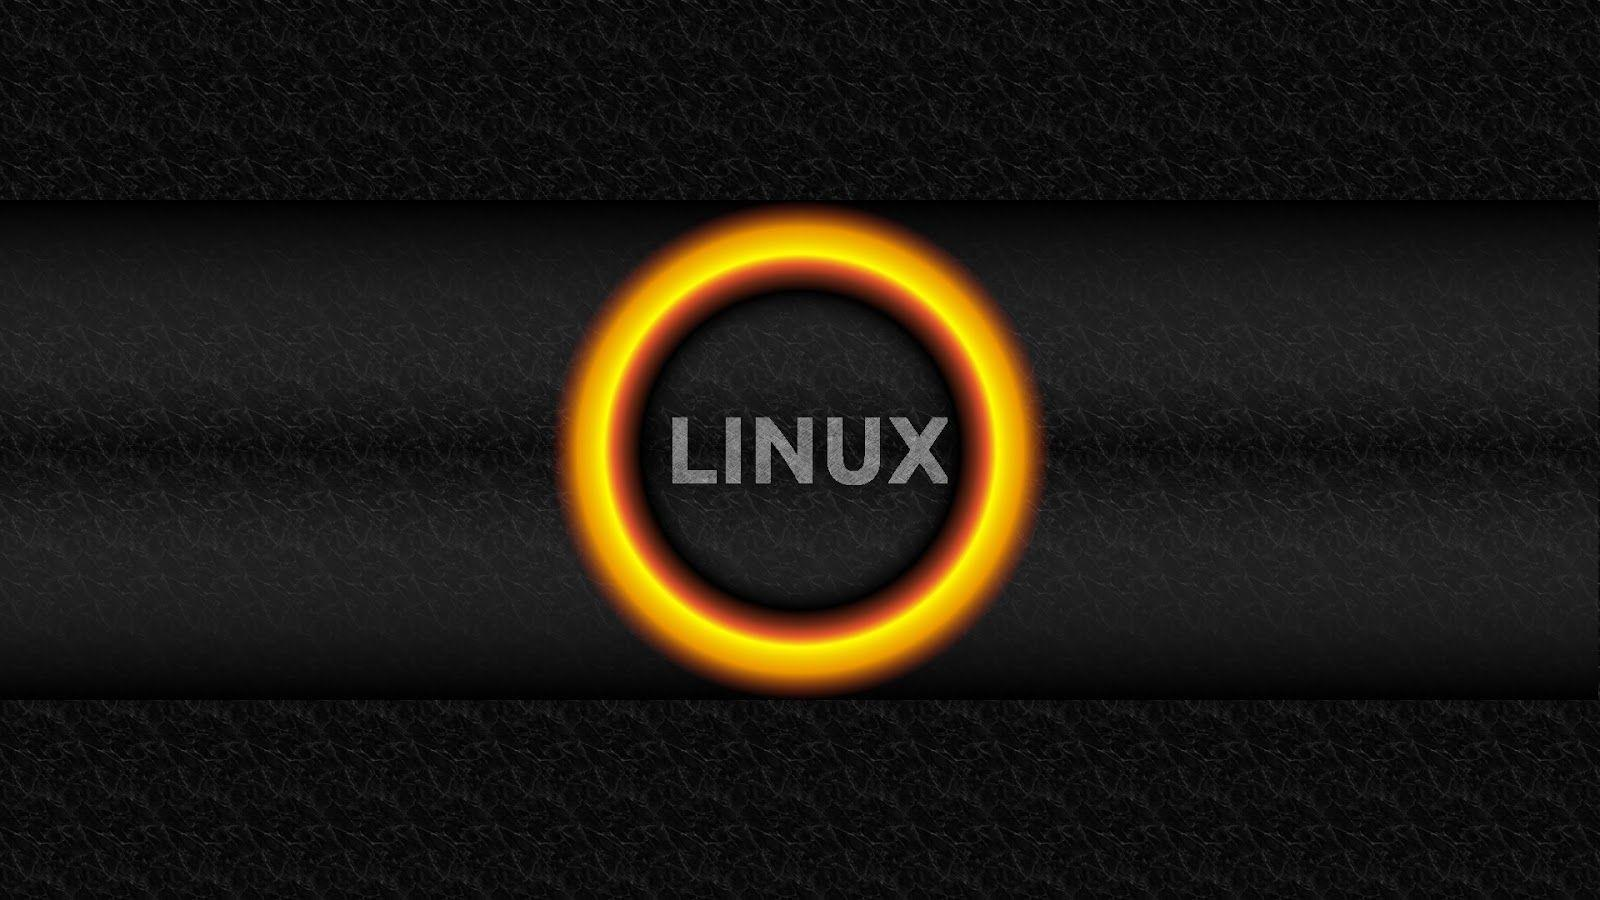 Linux Wallpaper Fullscreen HD #5316 Wallpaper | Cool Walldiskpaper.com